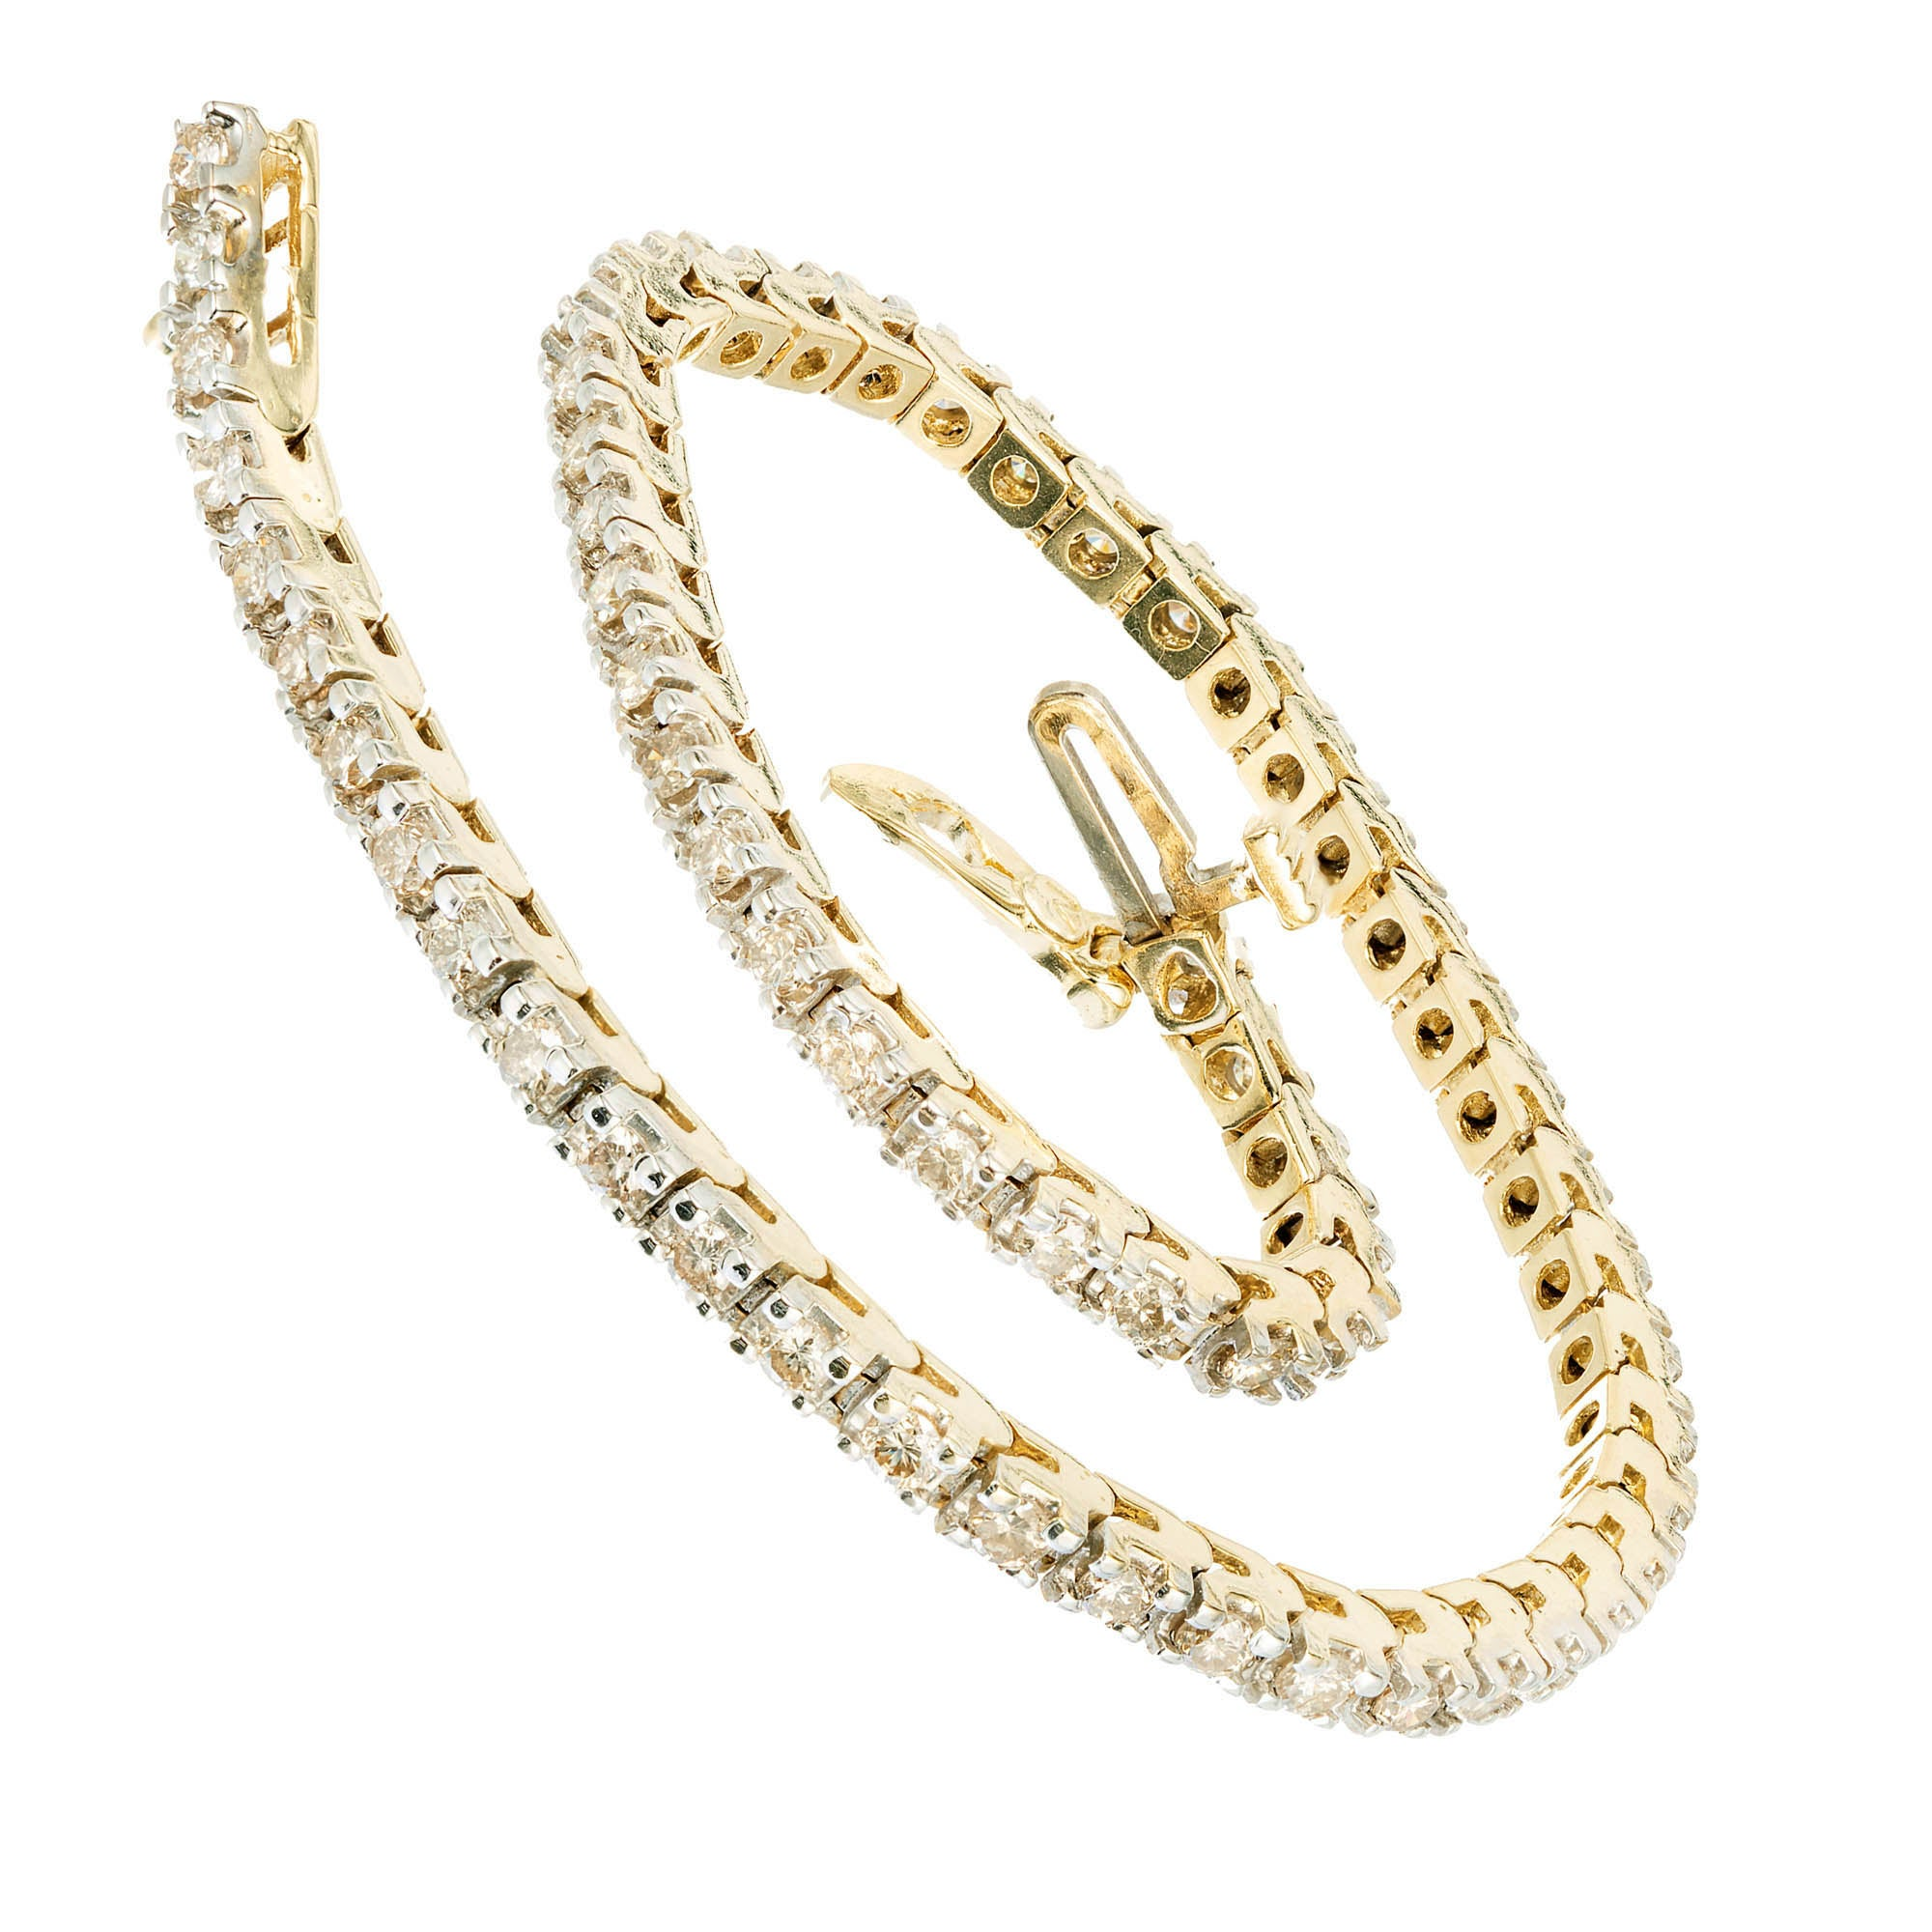 1.60 Carat Diamond Yellow Gold Tennis Bracelet